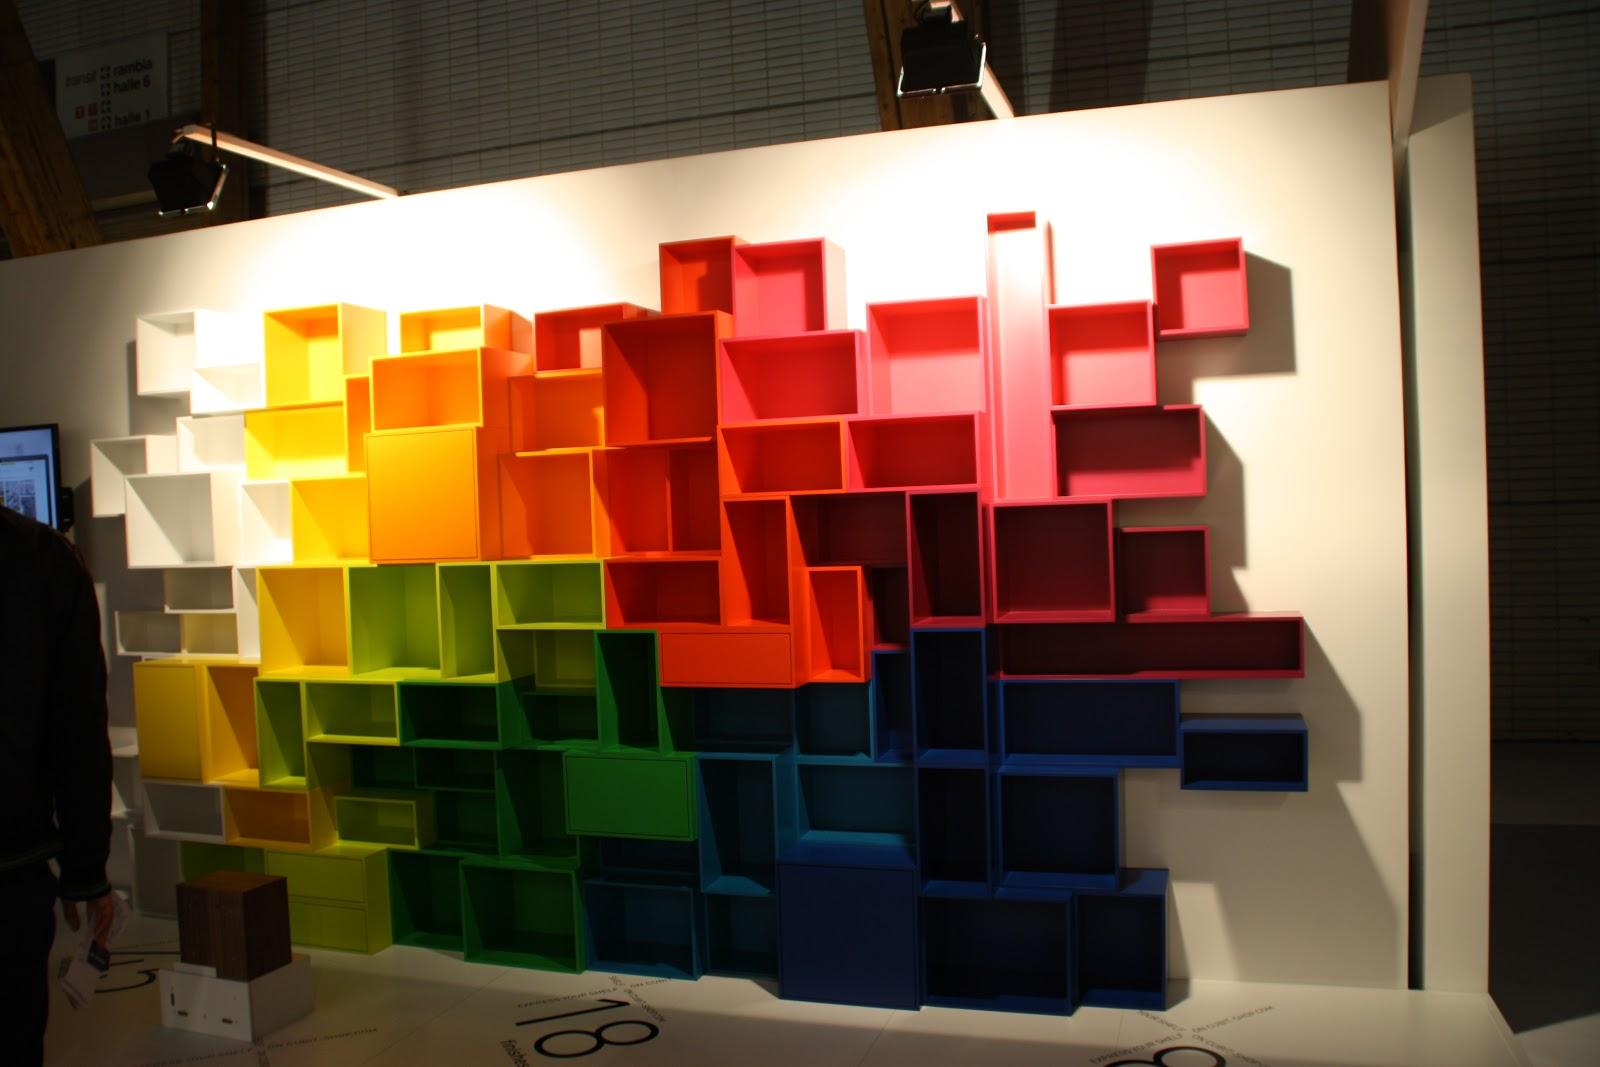 Open your space november 2012 for Gulden interieur